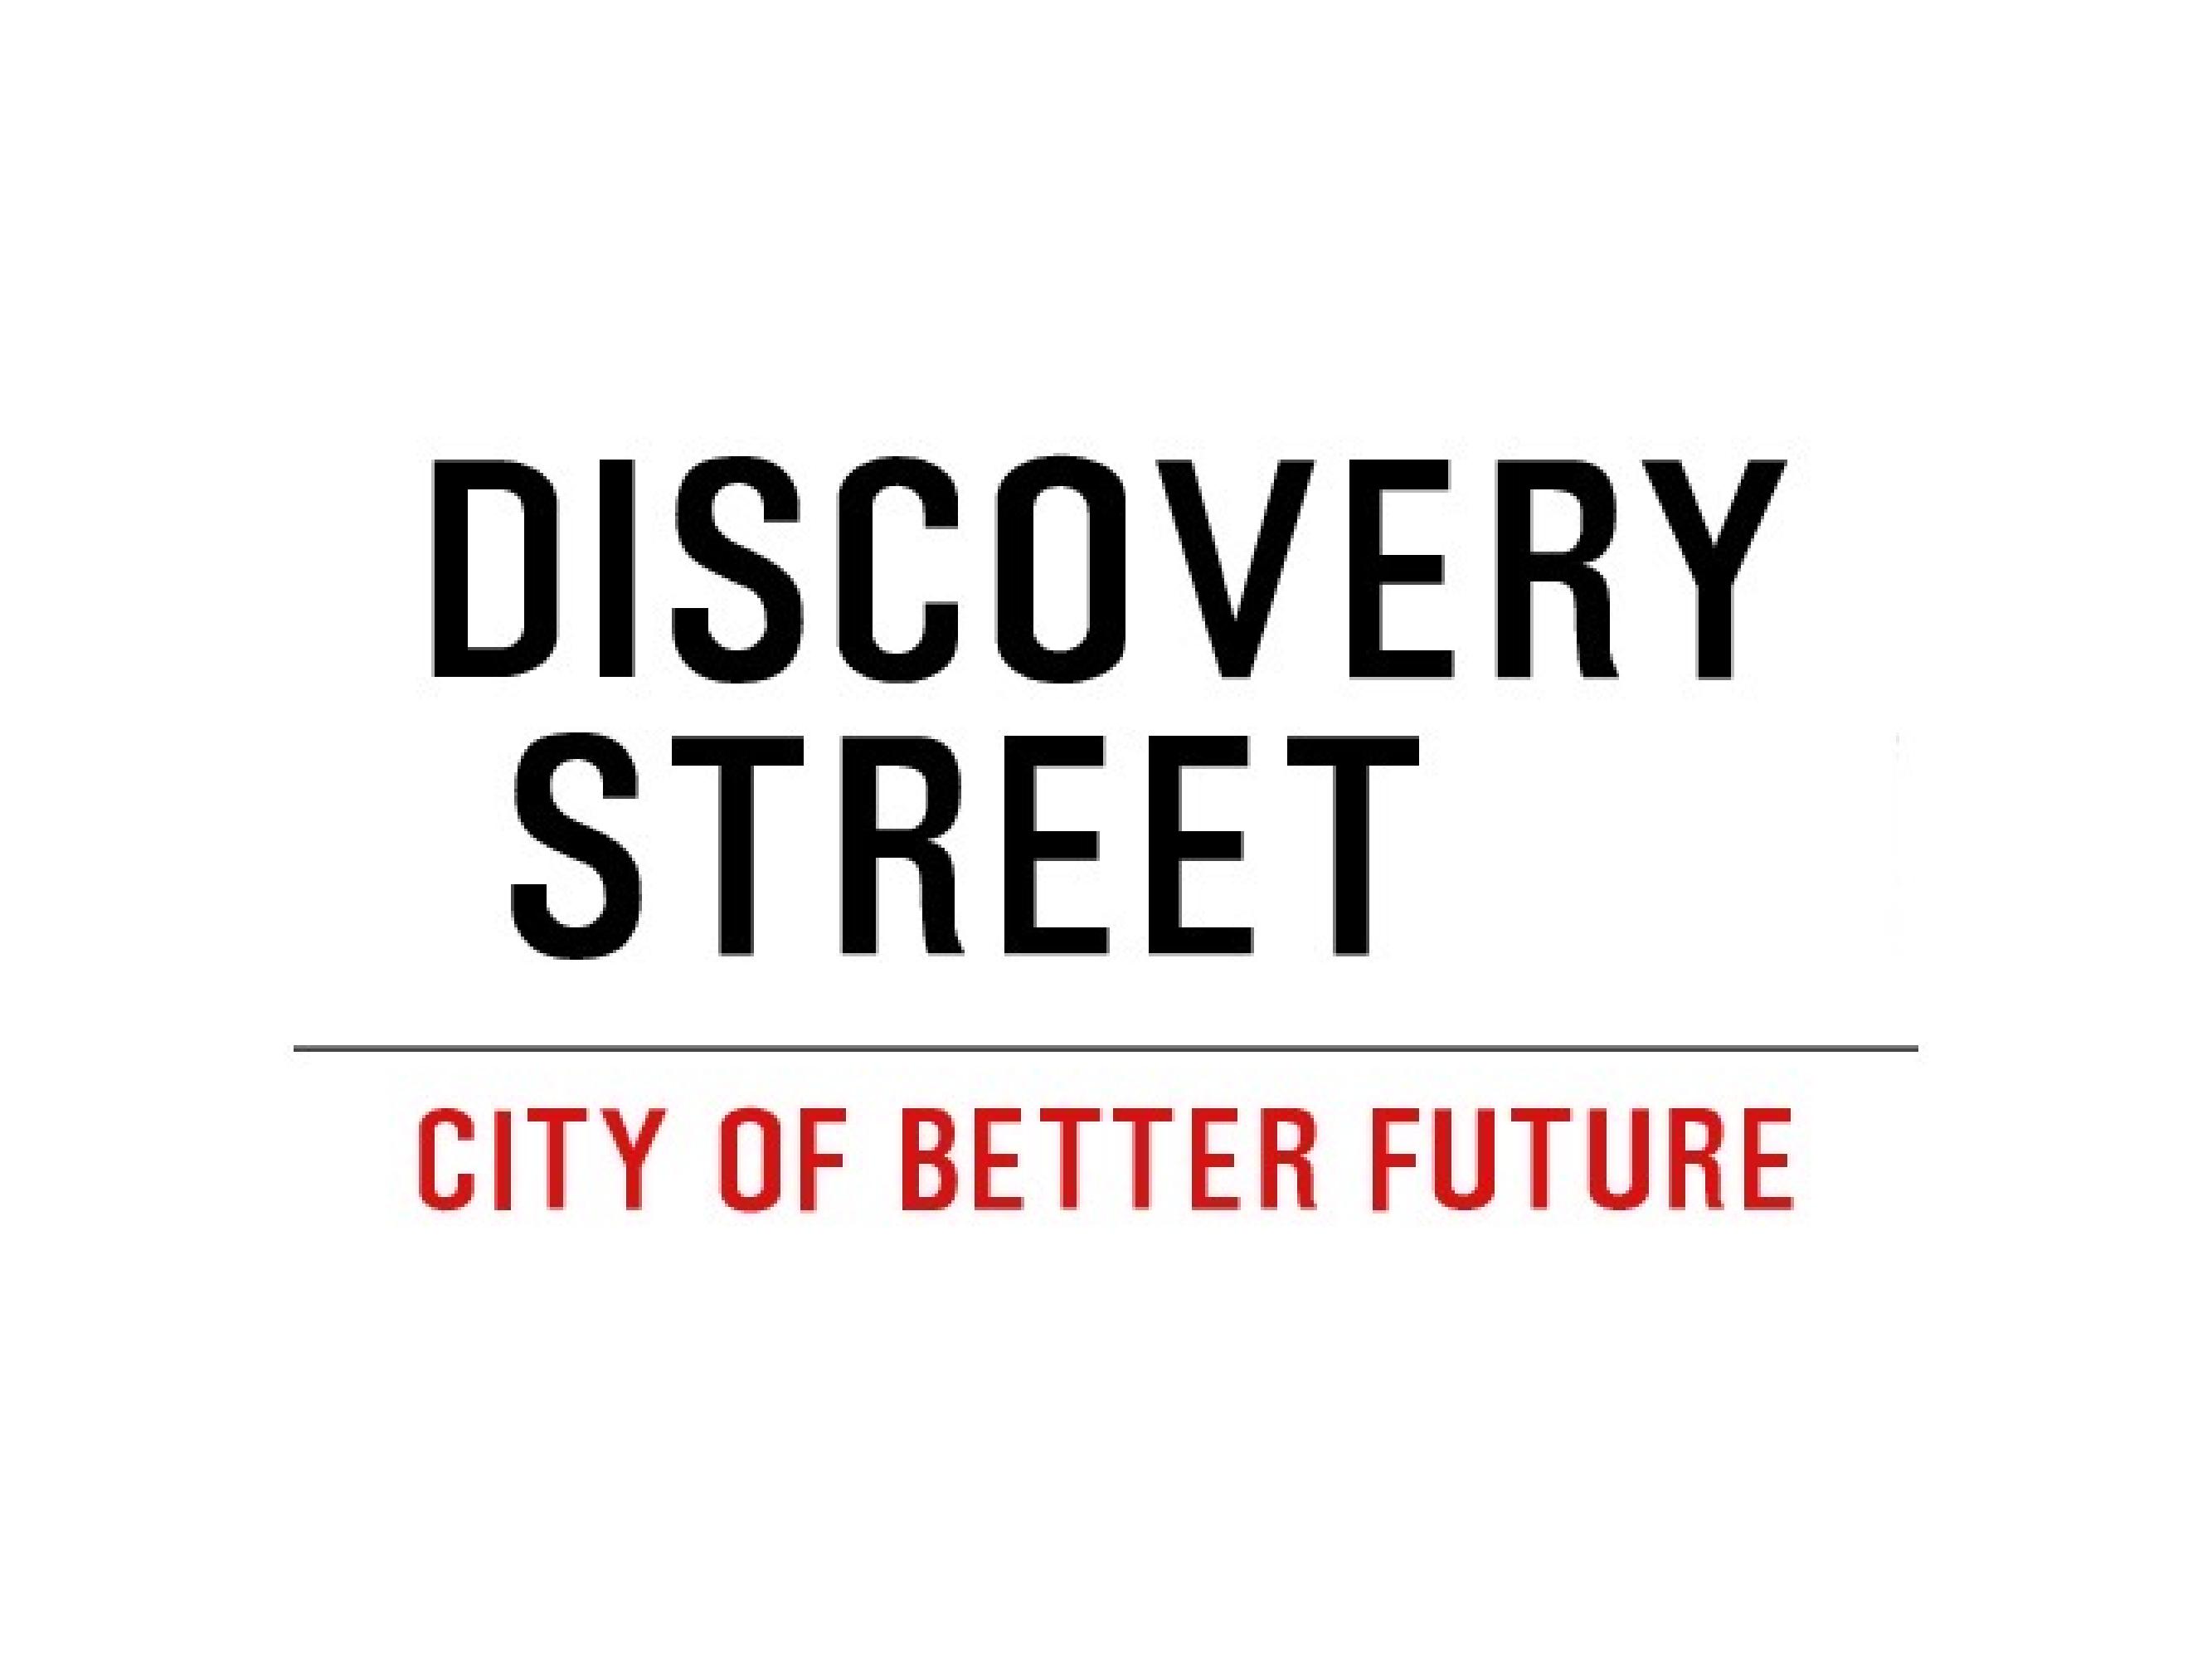 discoverystreet-1-07-07